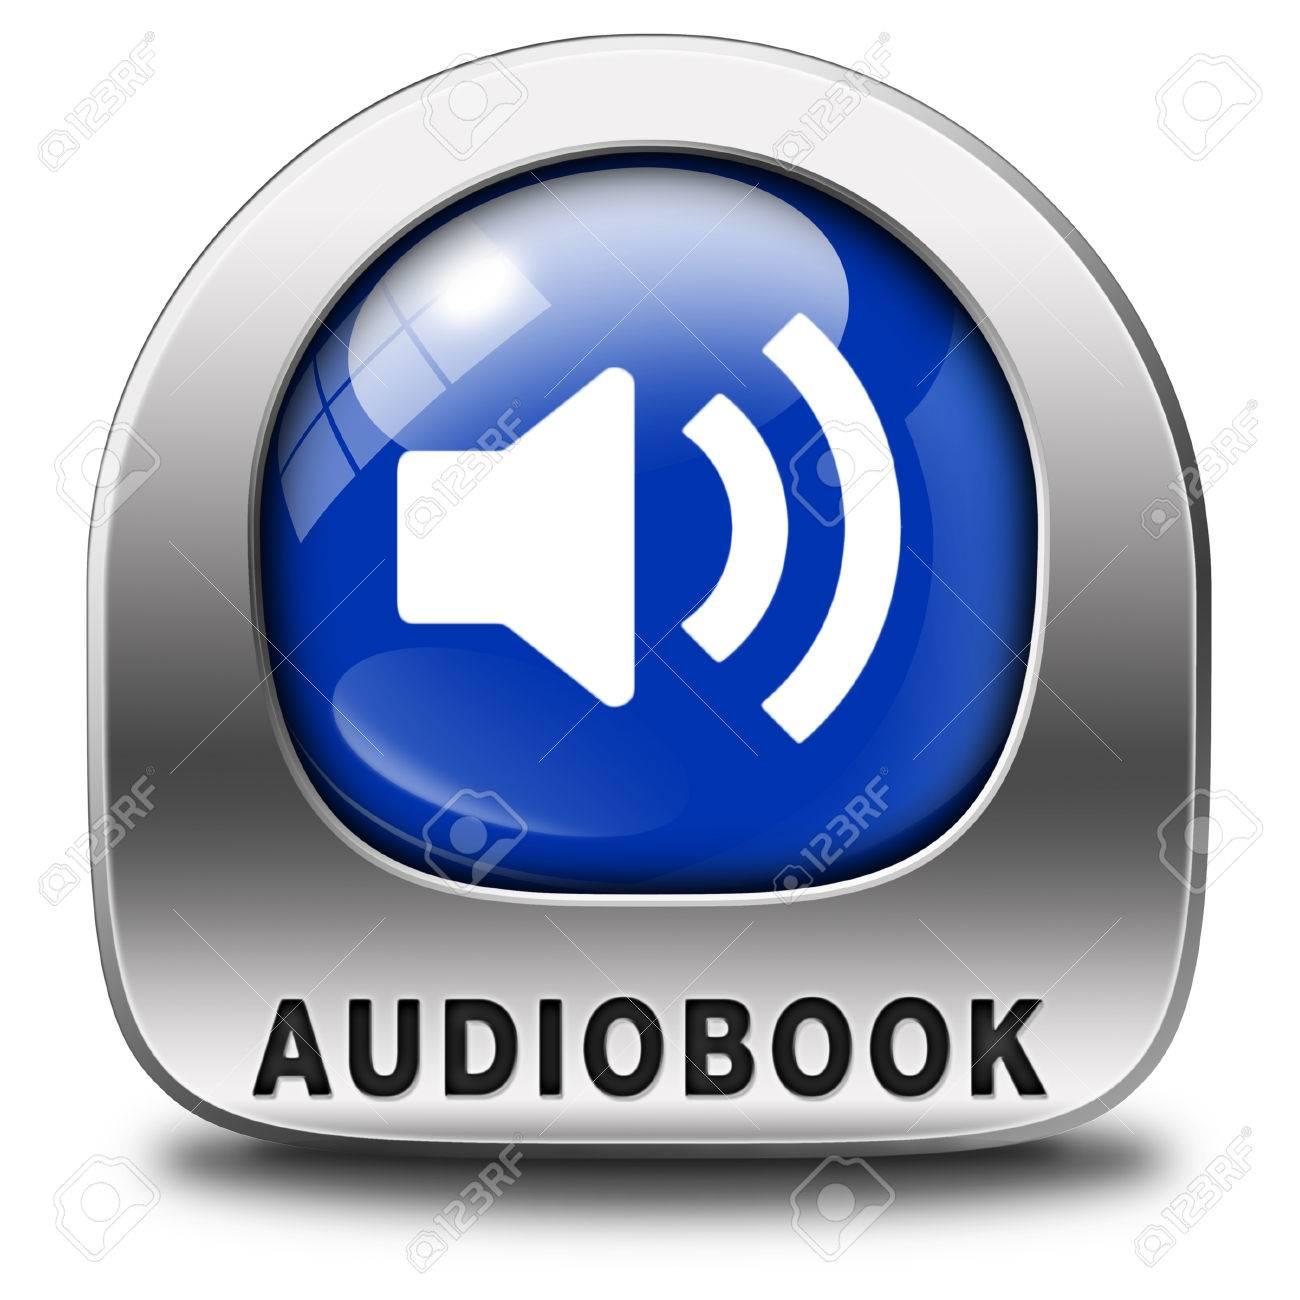 acheter livre audio